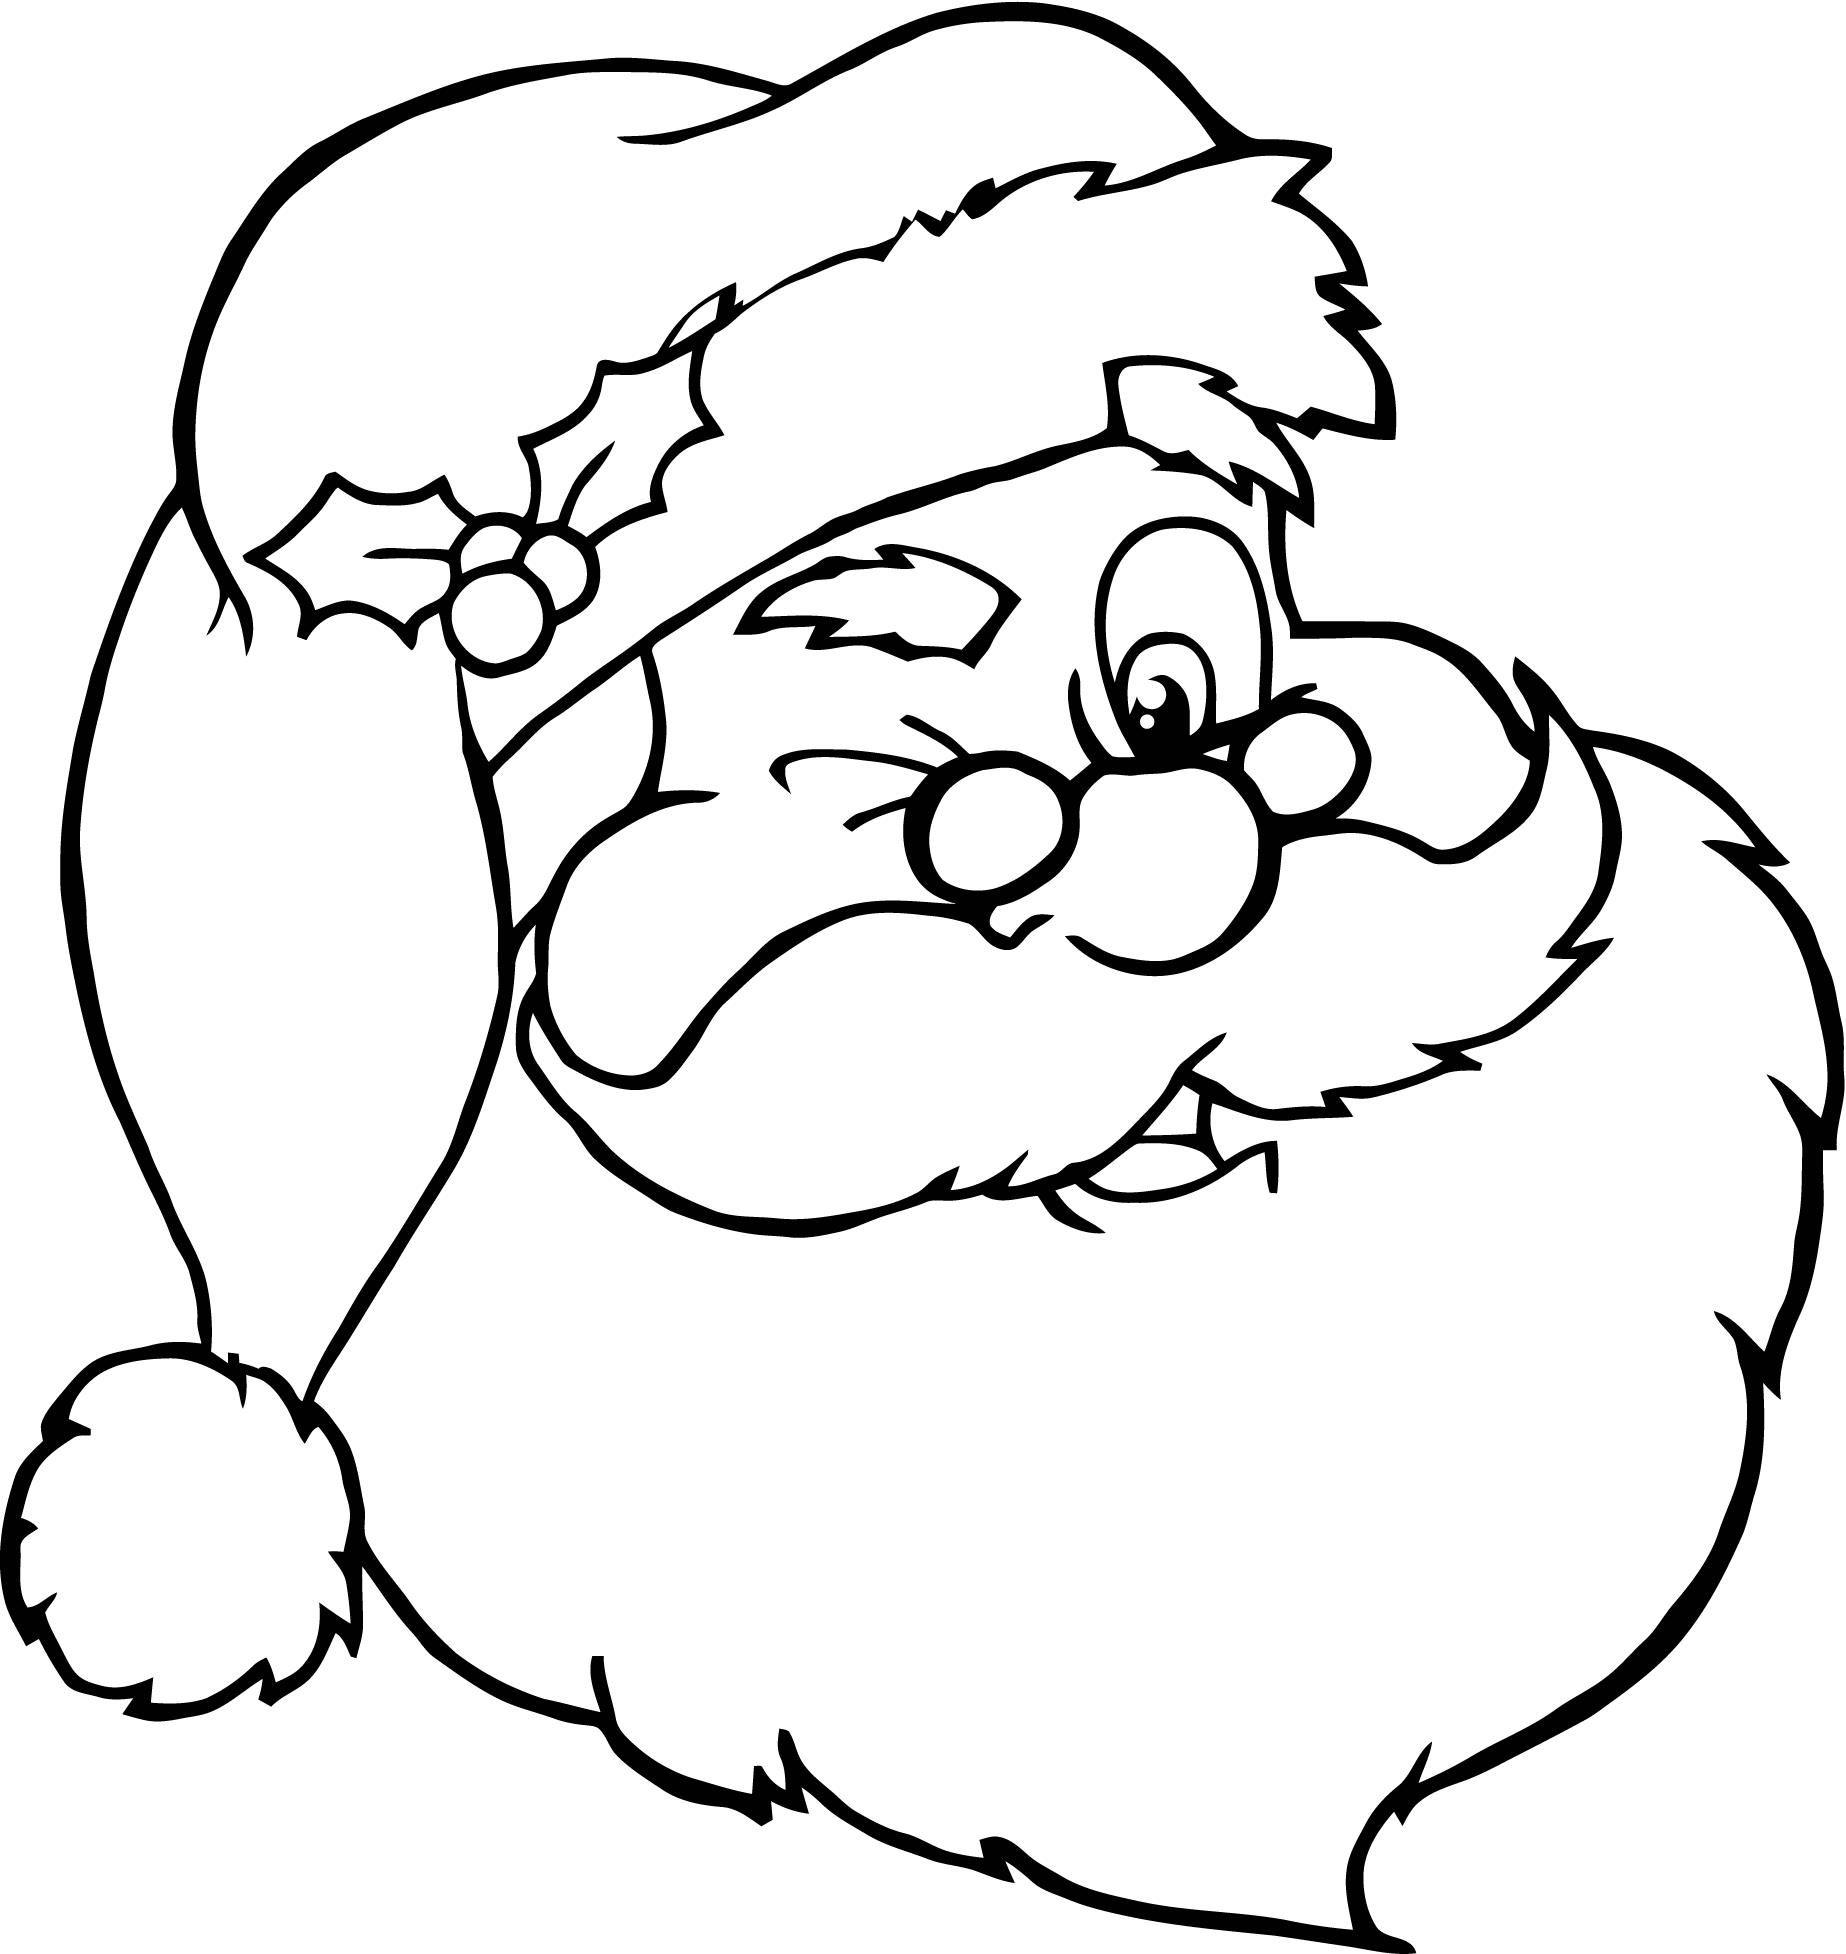 Santa Face Coloring Pages Google Search Papa Noel Dibujo Cara De Papa Noel Papa Noel Para Pintar